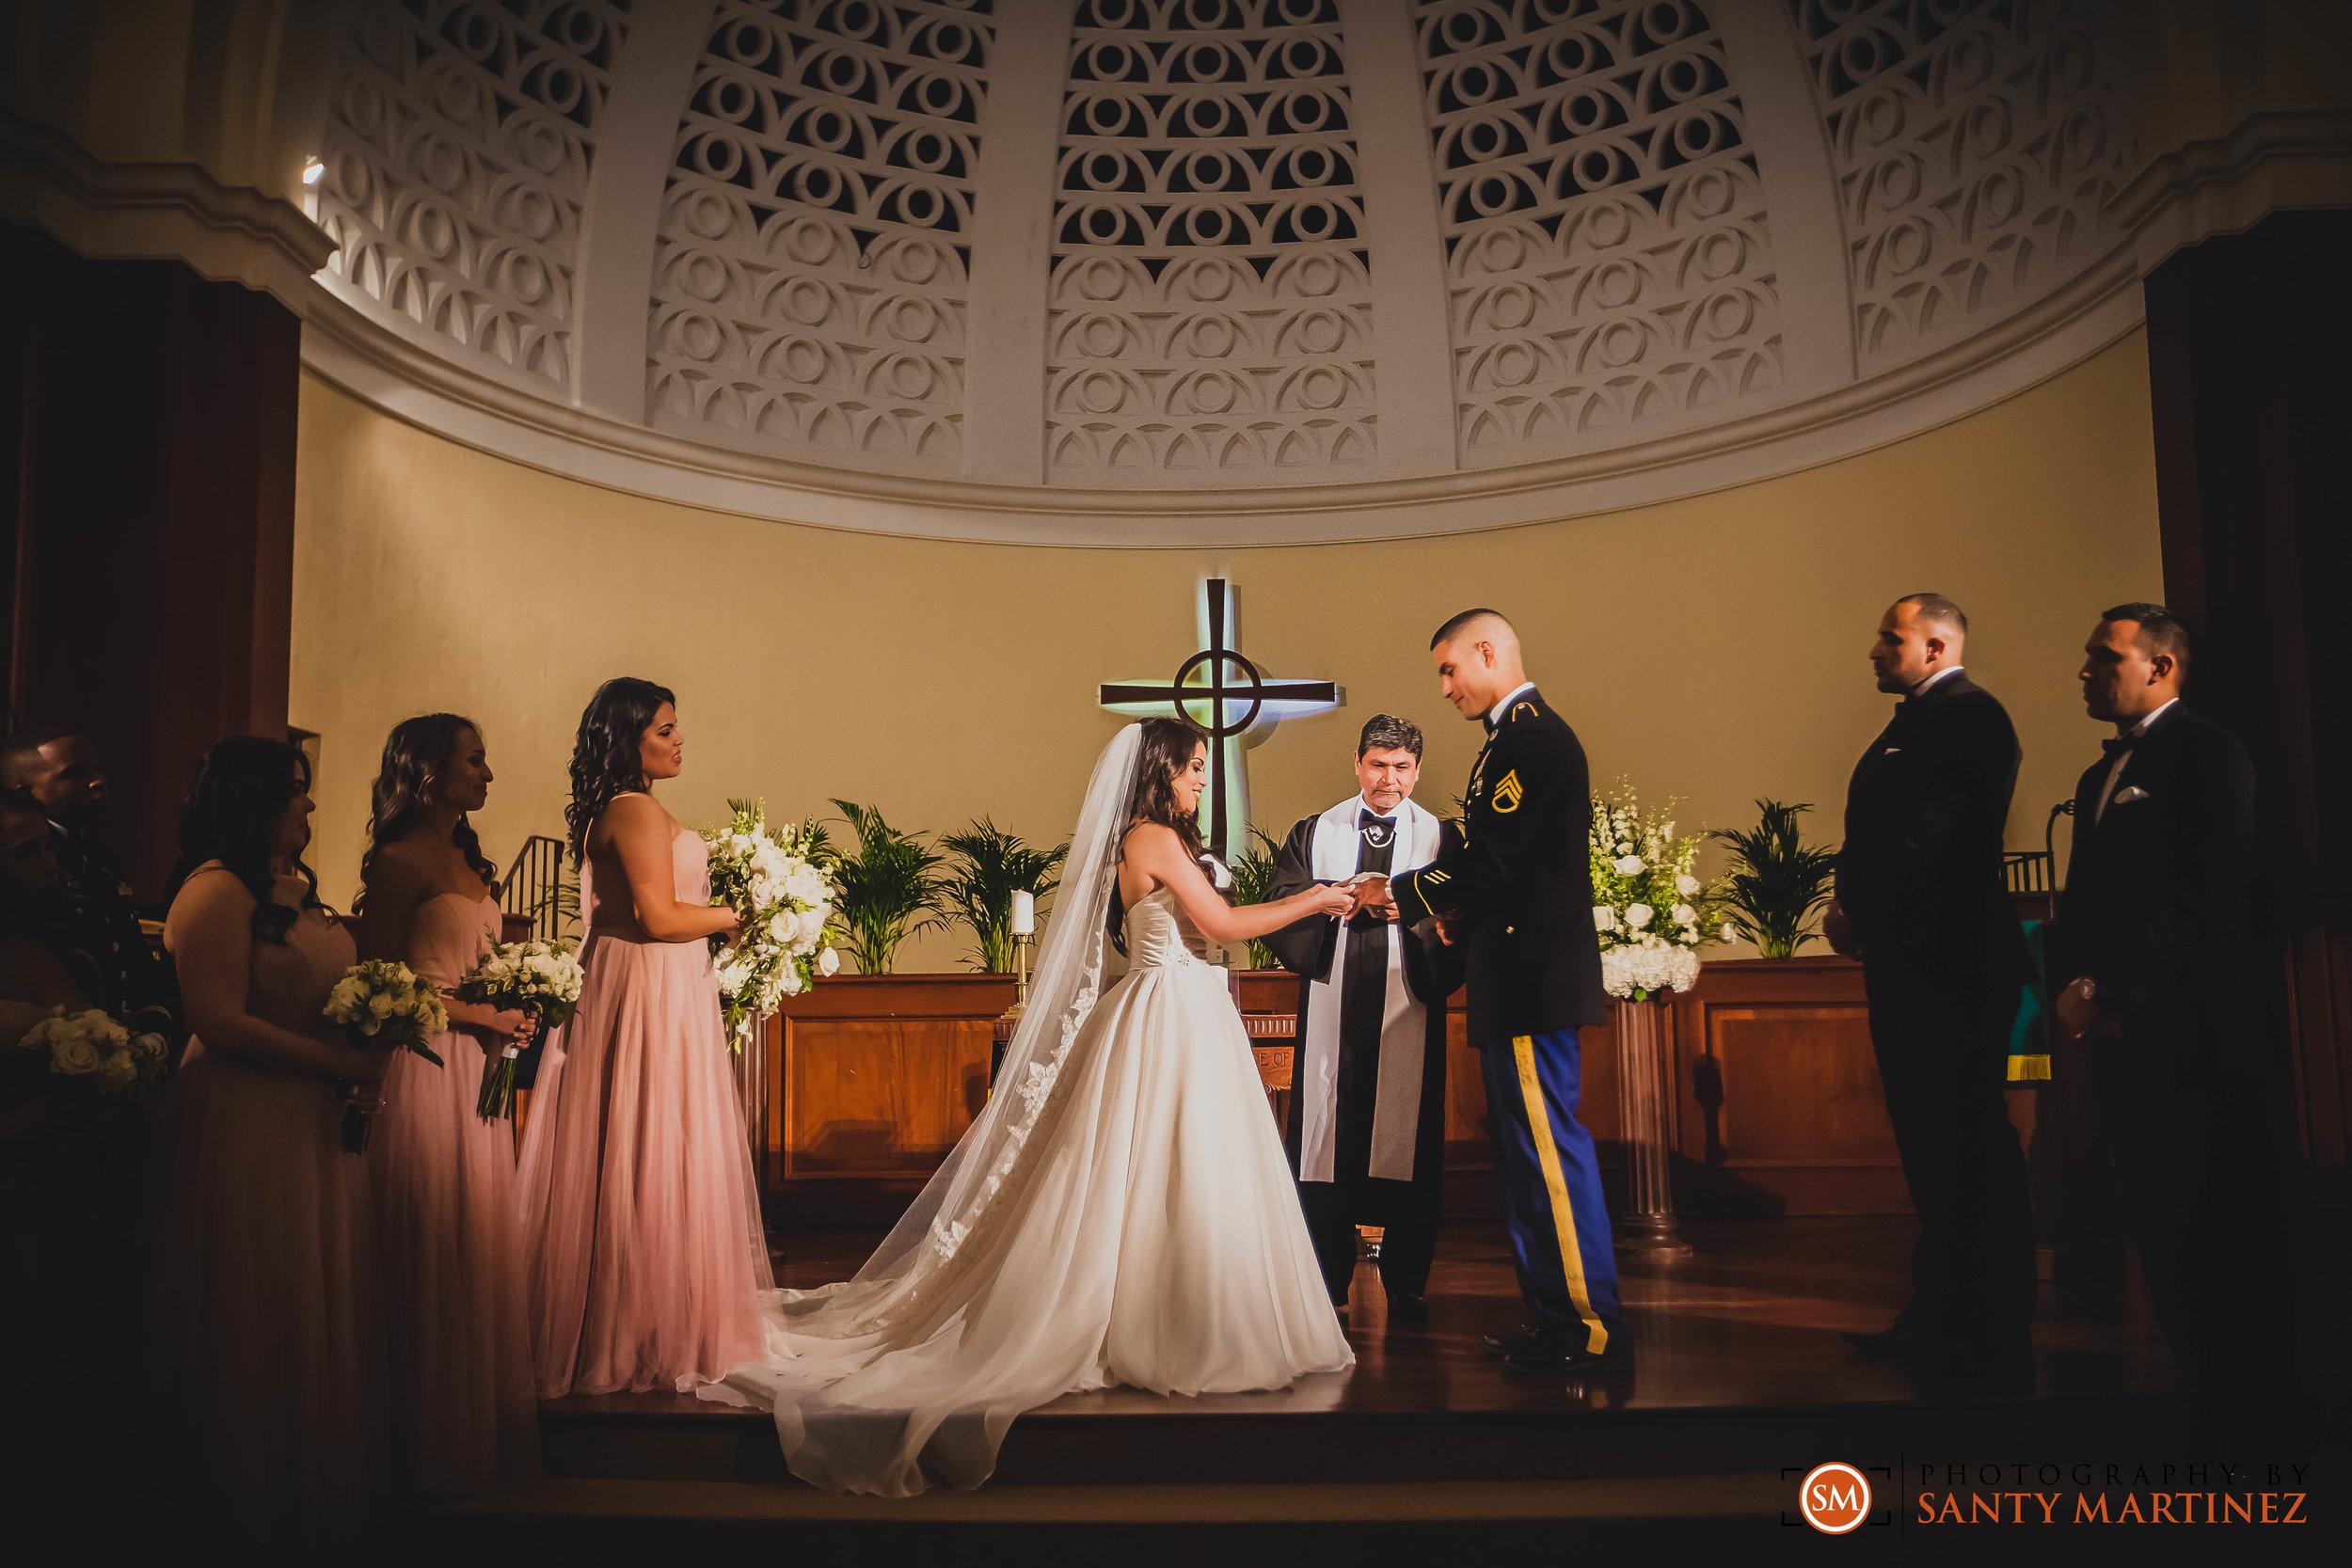 Wedding First Miami Presbyterian Church - Photography by Santy Martinez-22.jpg